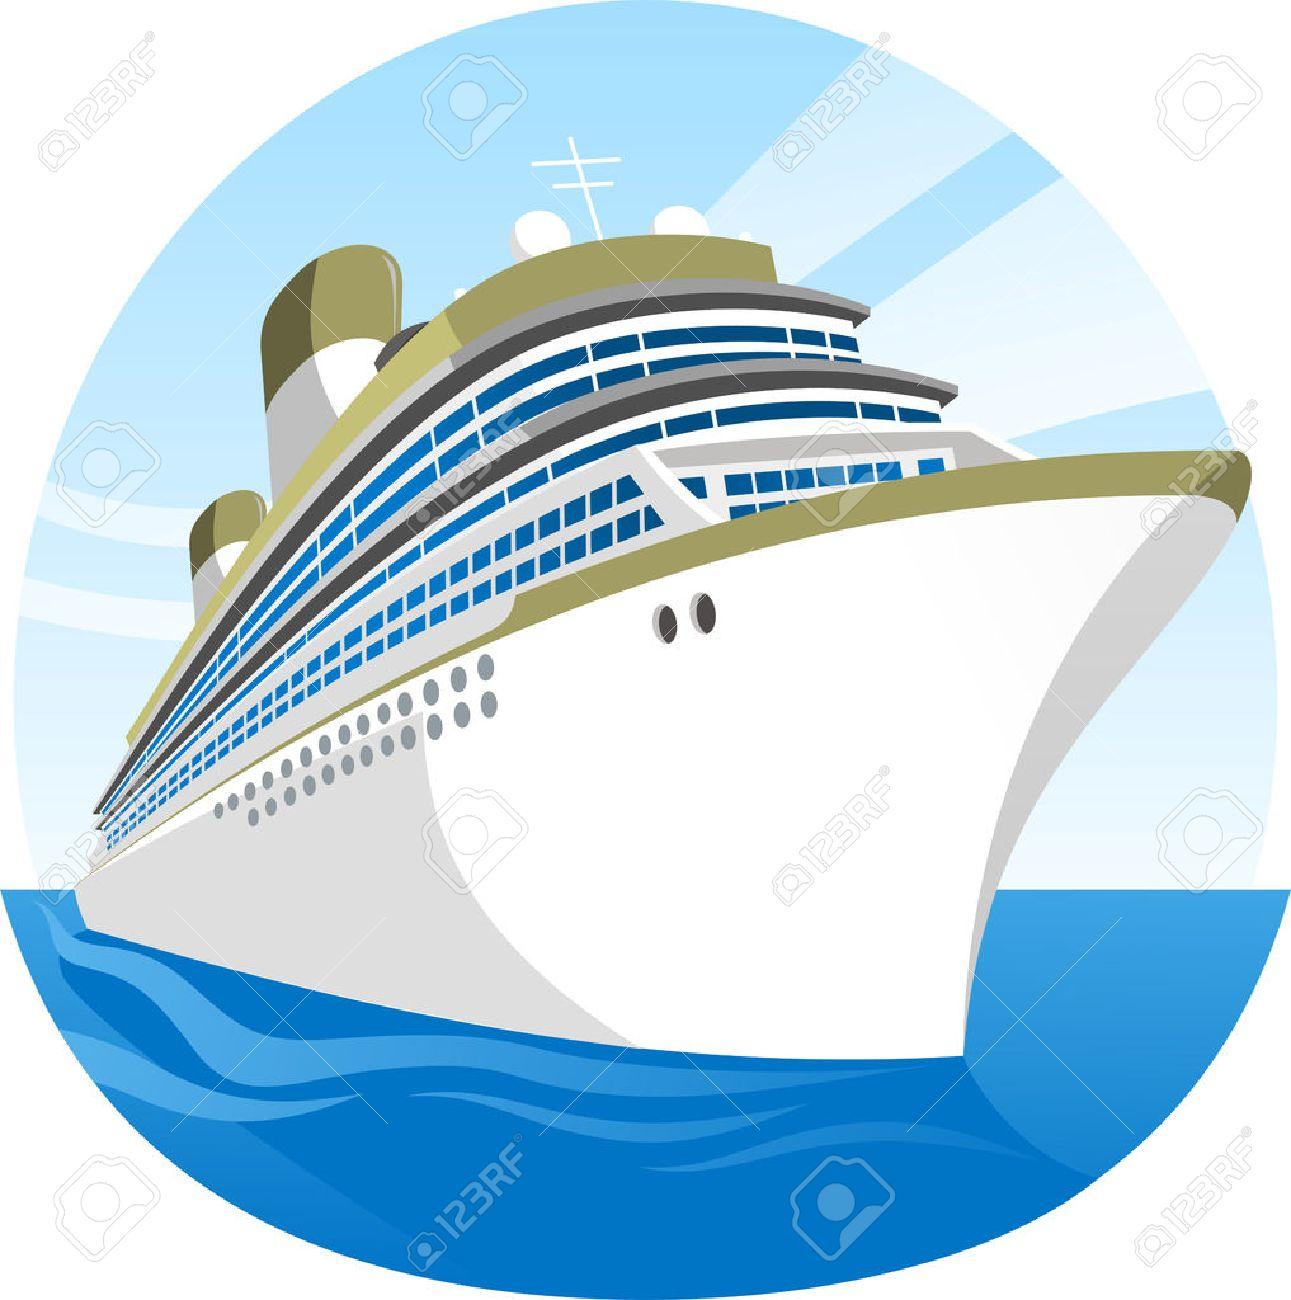 cruise ship sea holidays vector illustration cartoon royalty free rh 123rf com no man's sky how to get alpha vector ship no man's sky how to get alpha vector ship